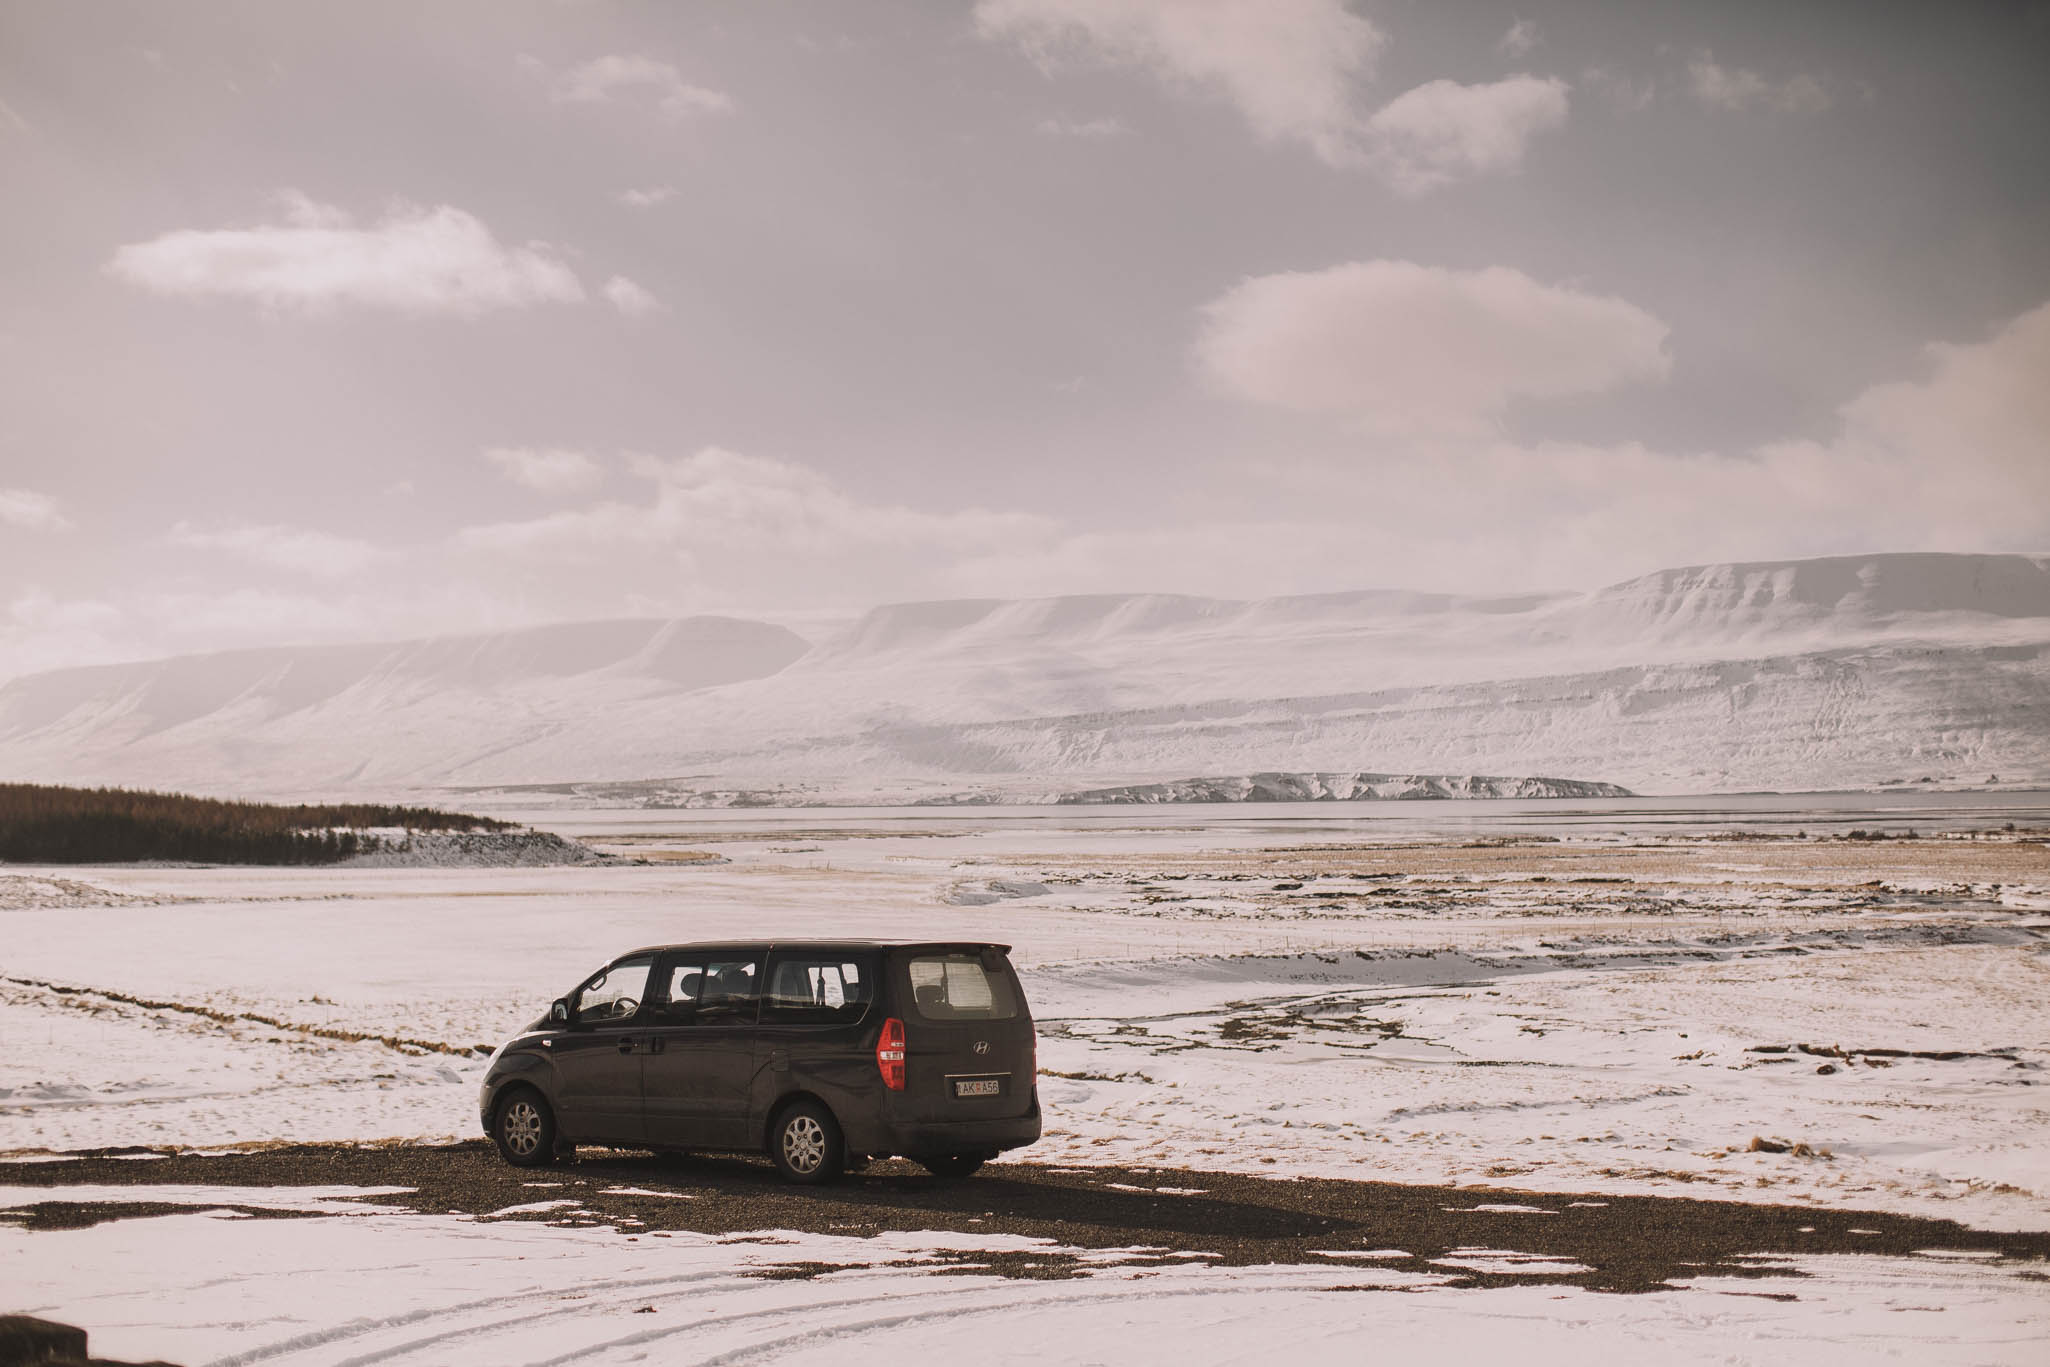 Road-trip-Islande-Iceland-Voyage-Travel-Portrait-Jérémy-Boyer-church-eglise-12.jpg